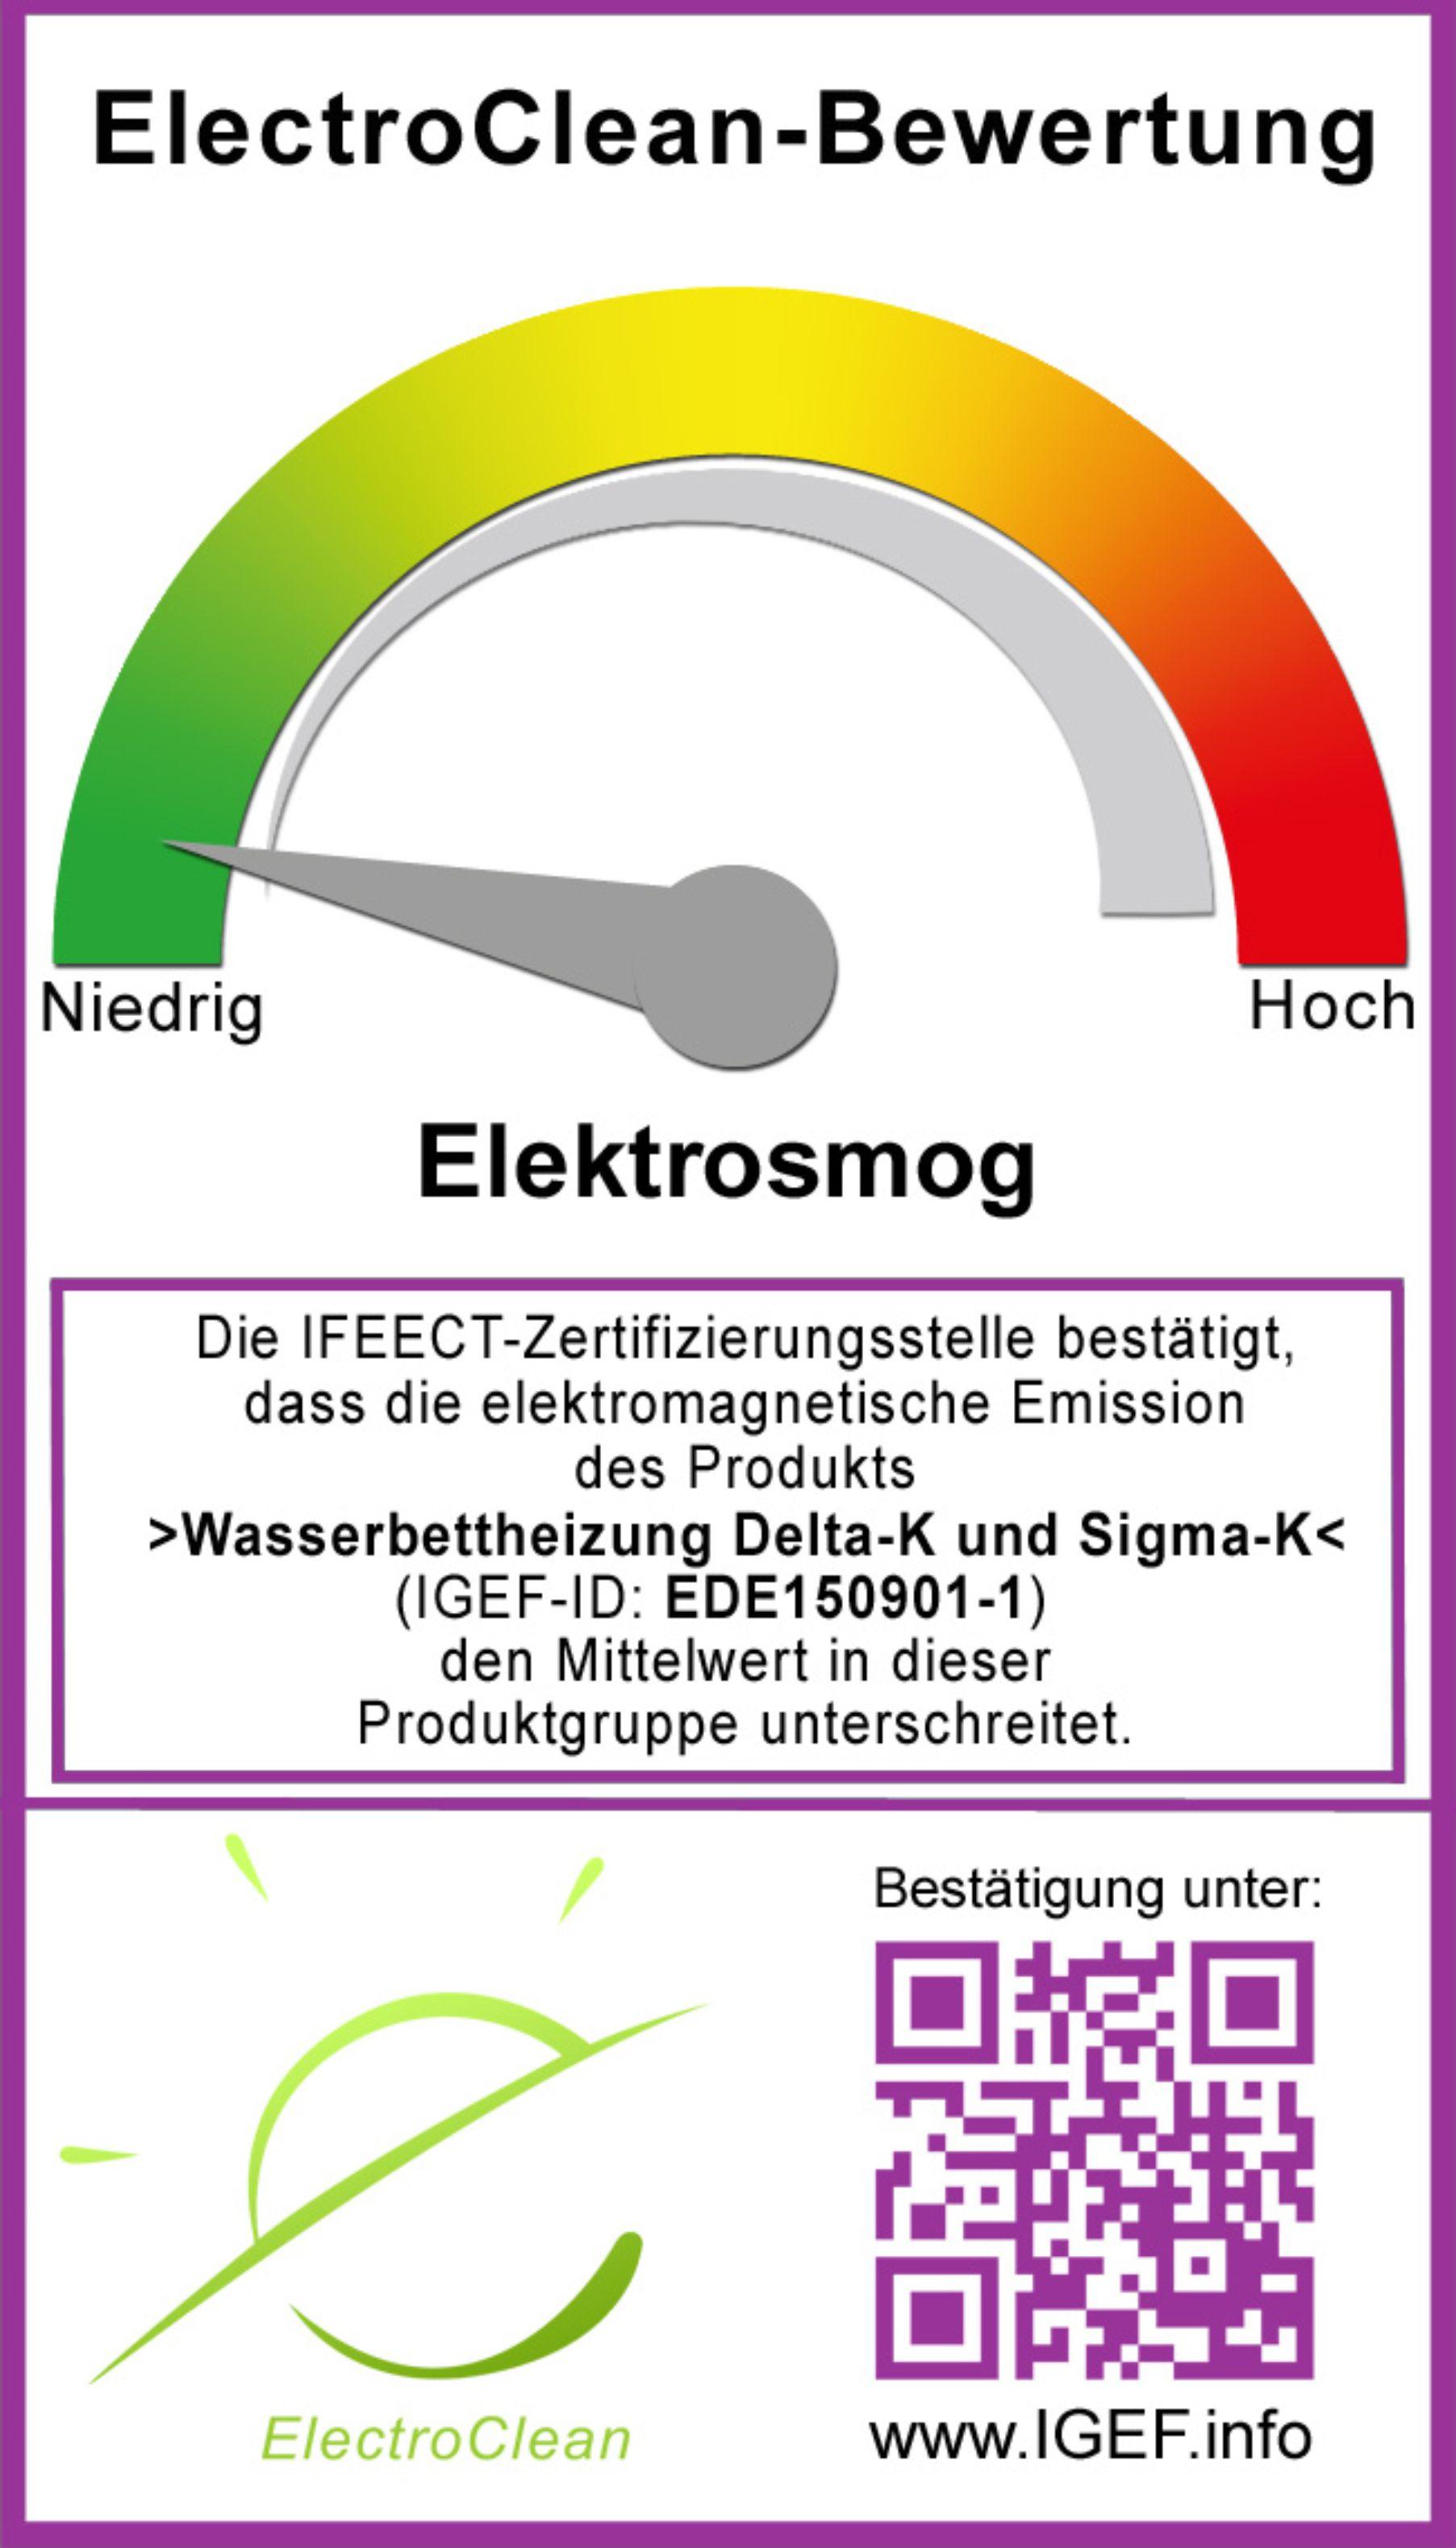 ElektroClean